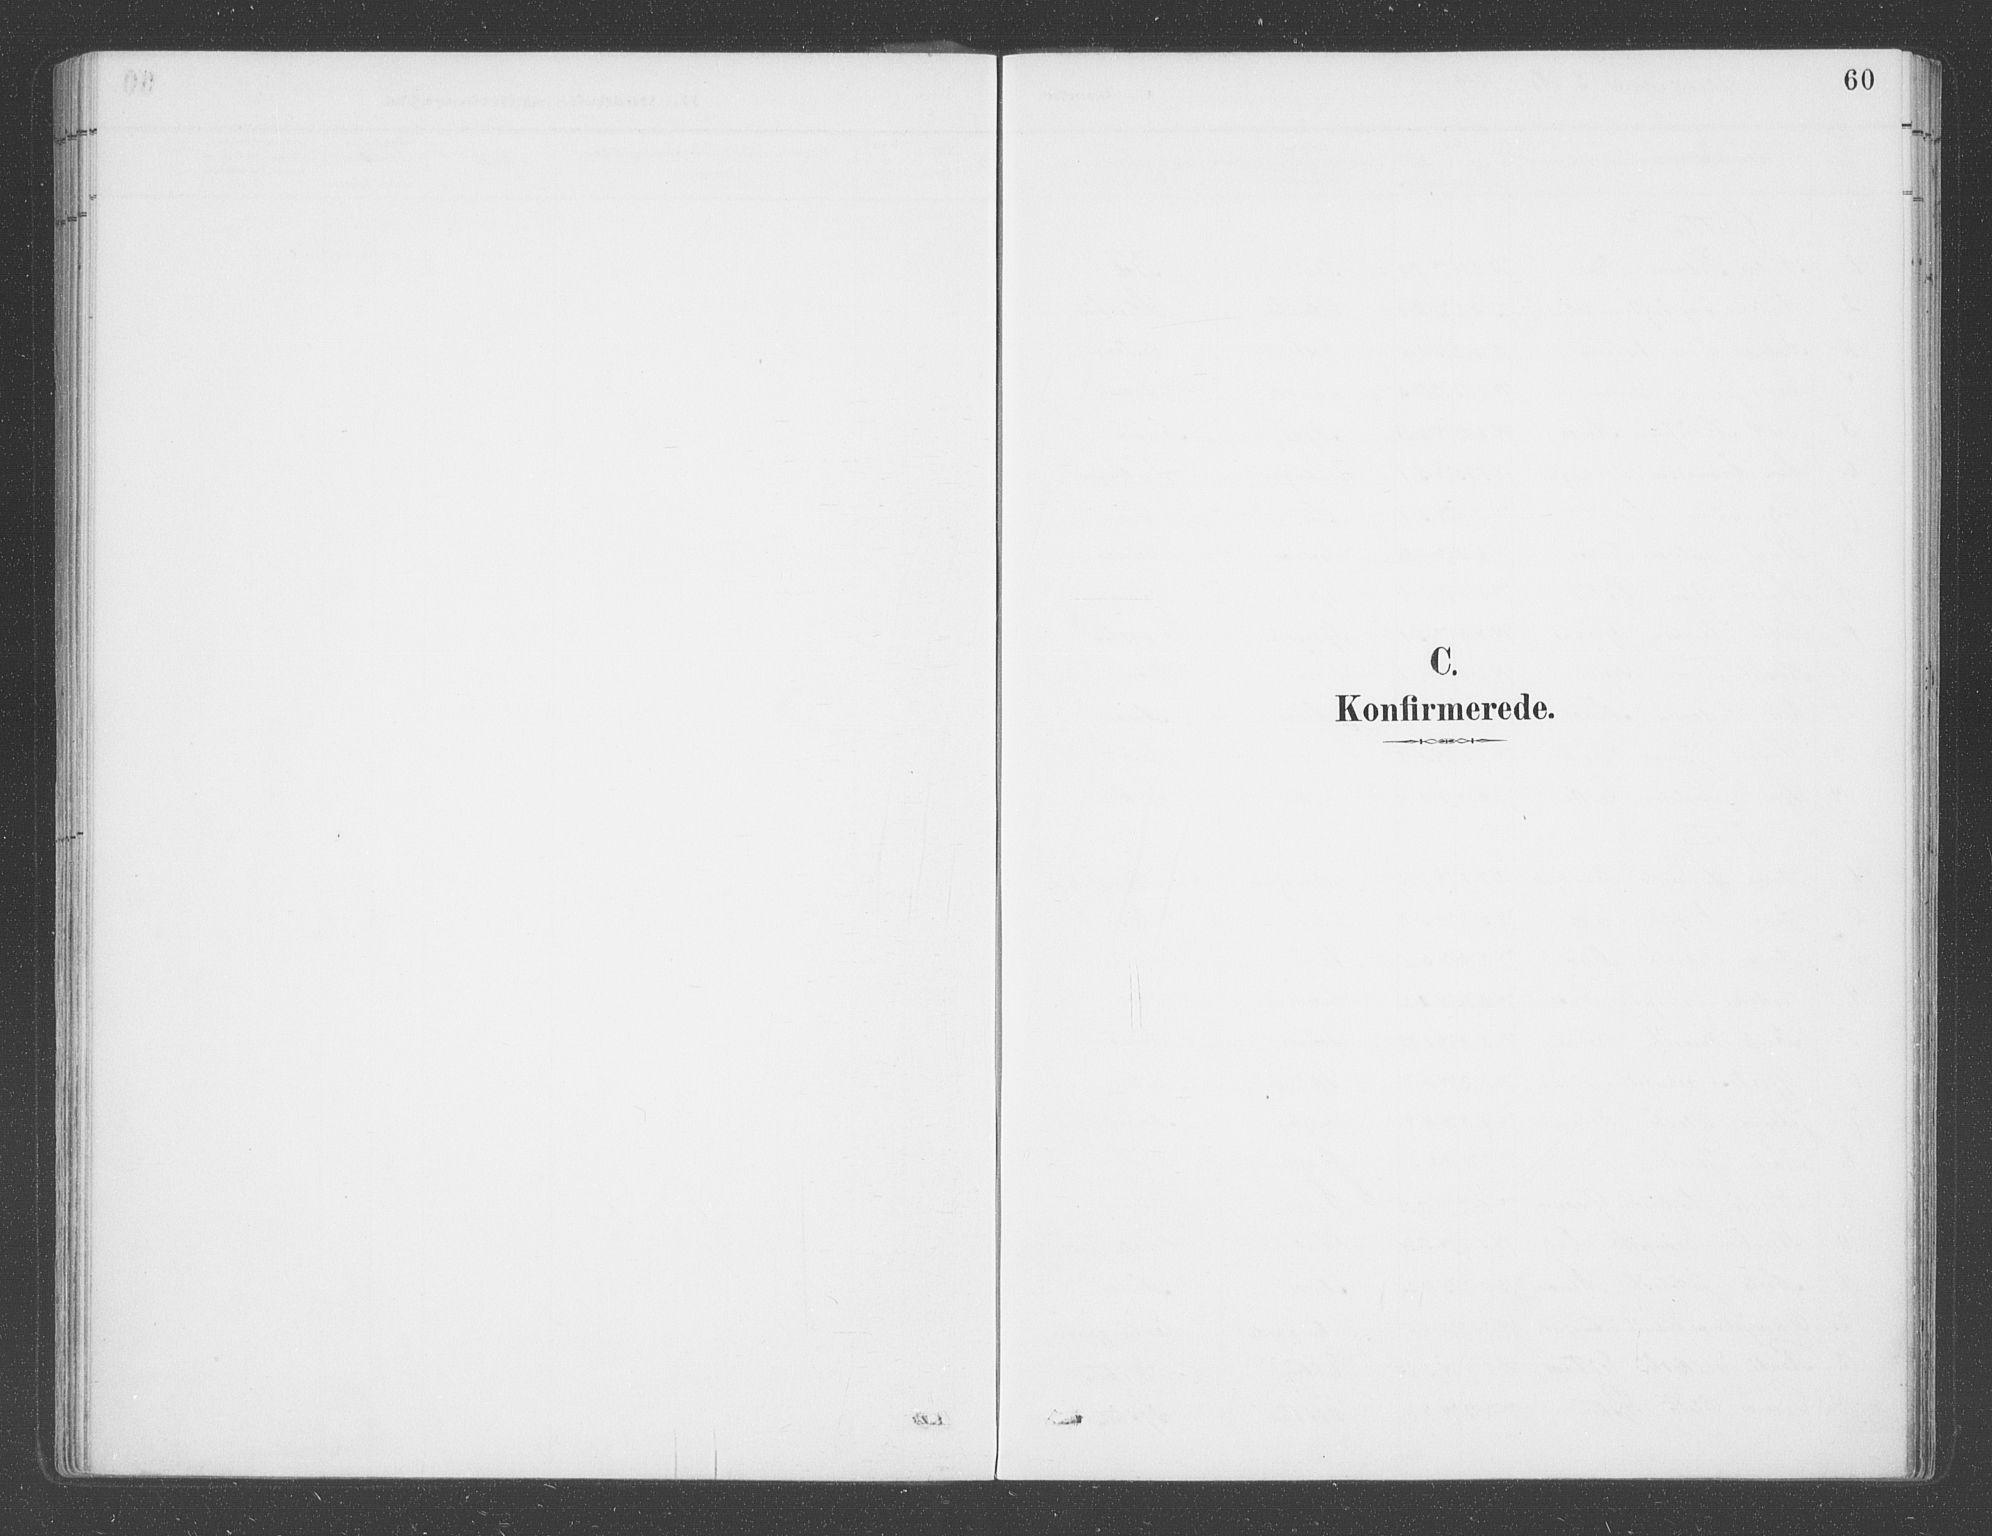 SAB, Balestrand sokneprestembete, H/Haa/Haab/L0001: Ministerialbok nr. B  1, 1889-1910, s. 60